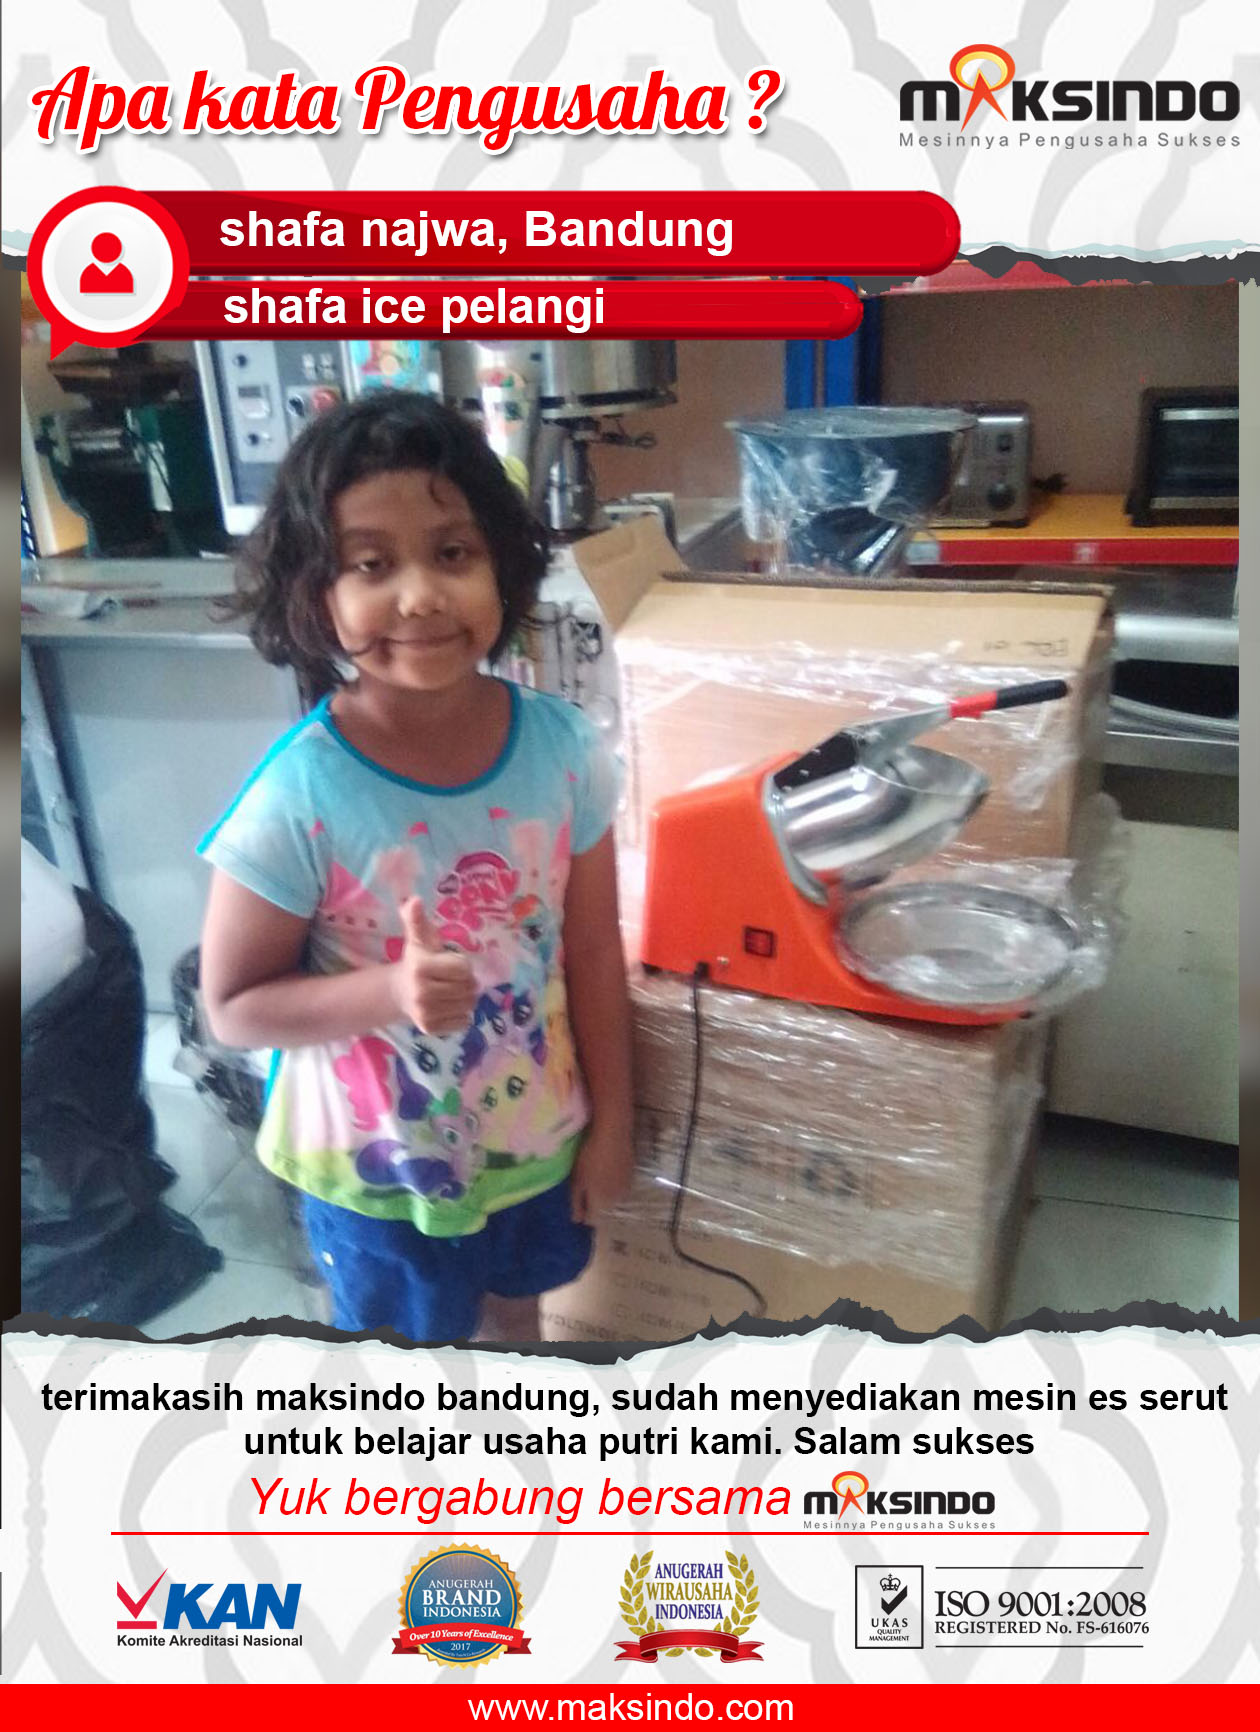 Shafa Ice Pelangi : Penyerutan Es Batu Makin Lancar Dengn Mesin Ice Crusher